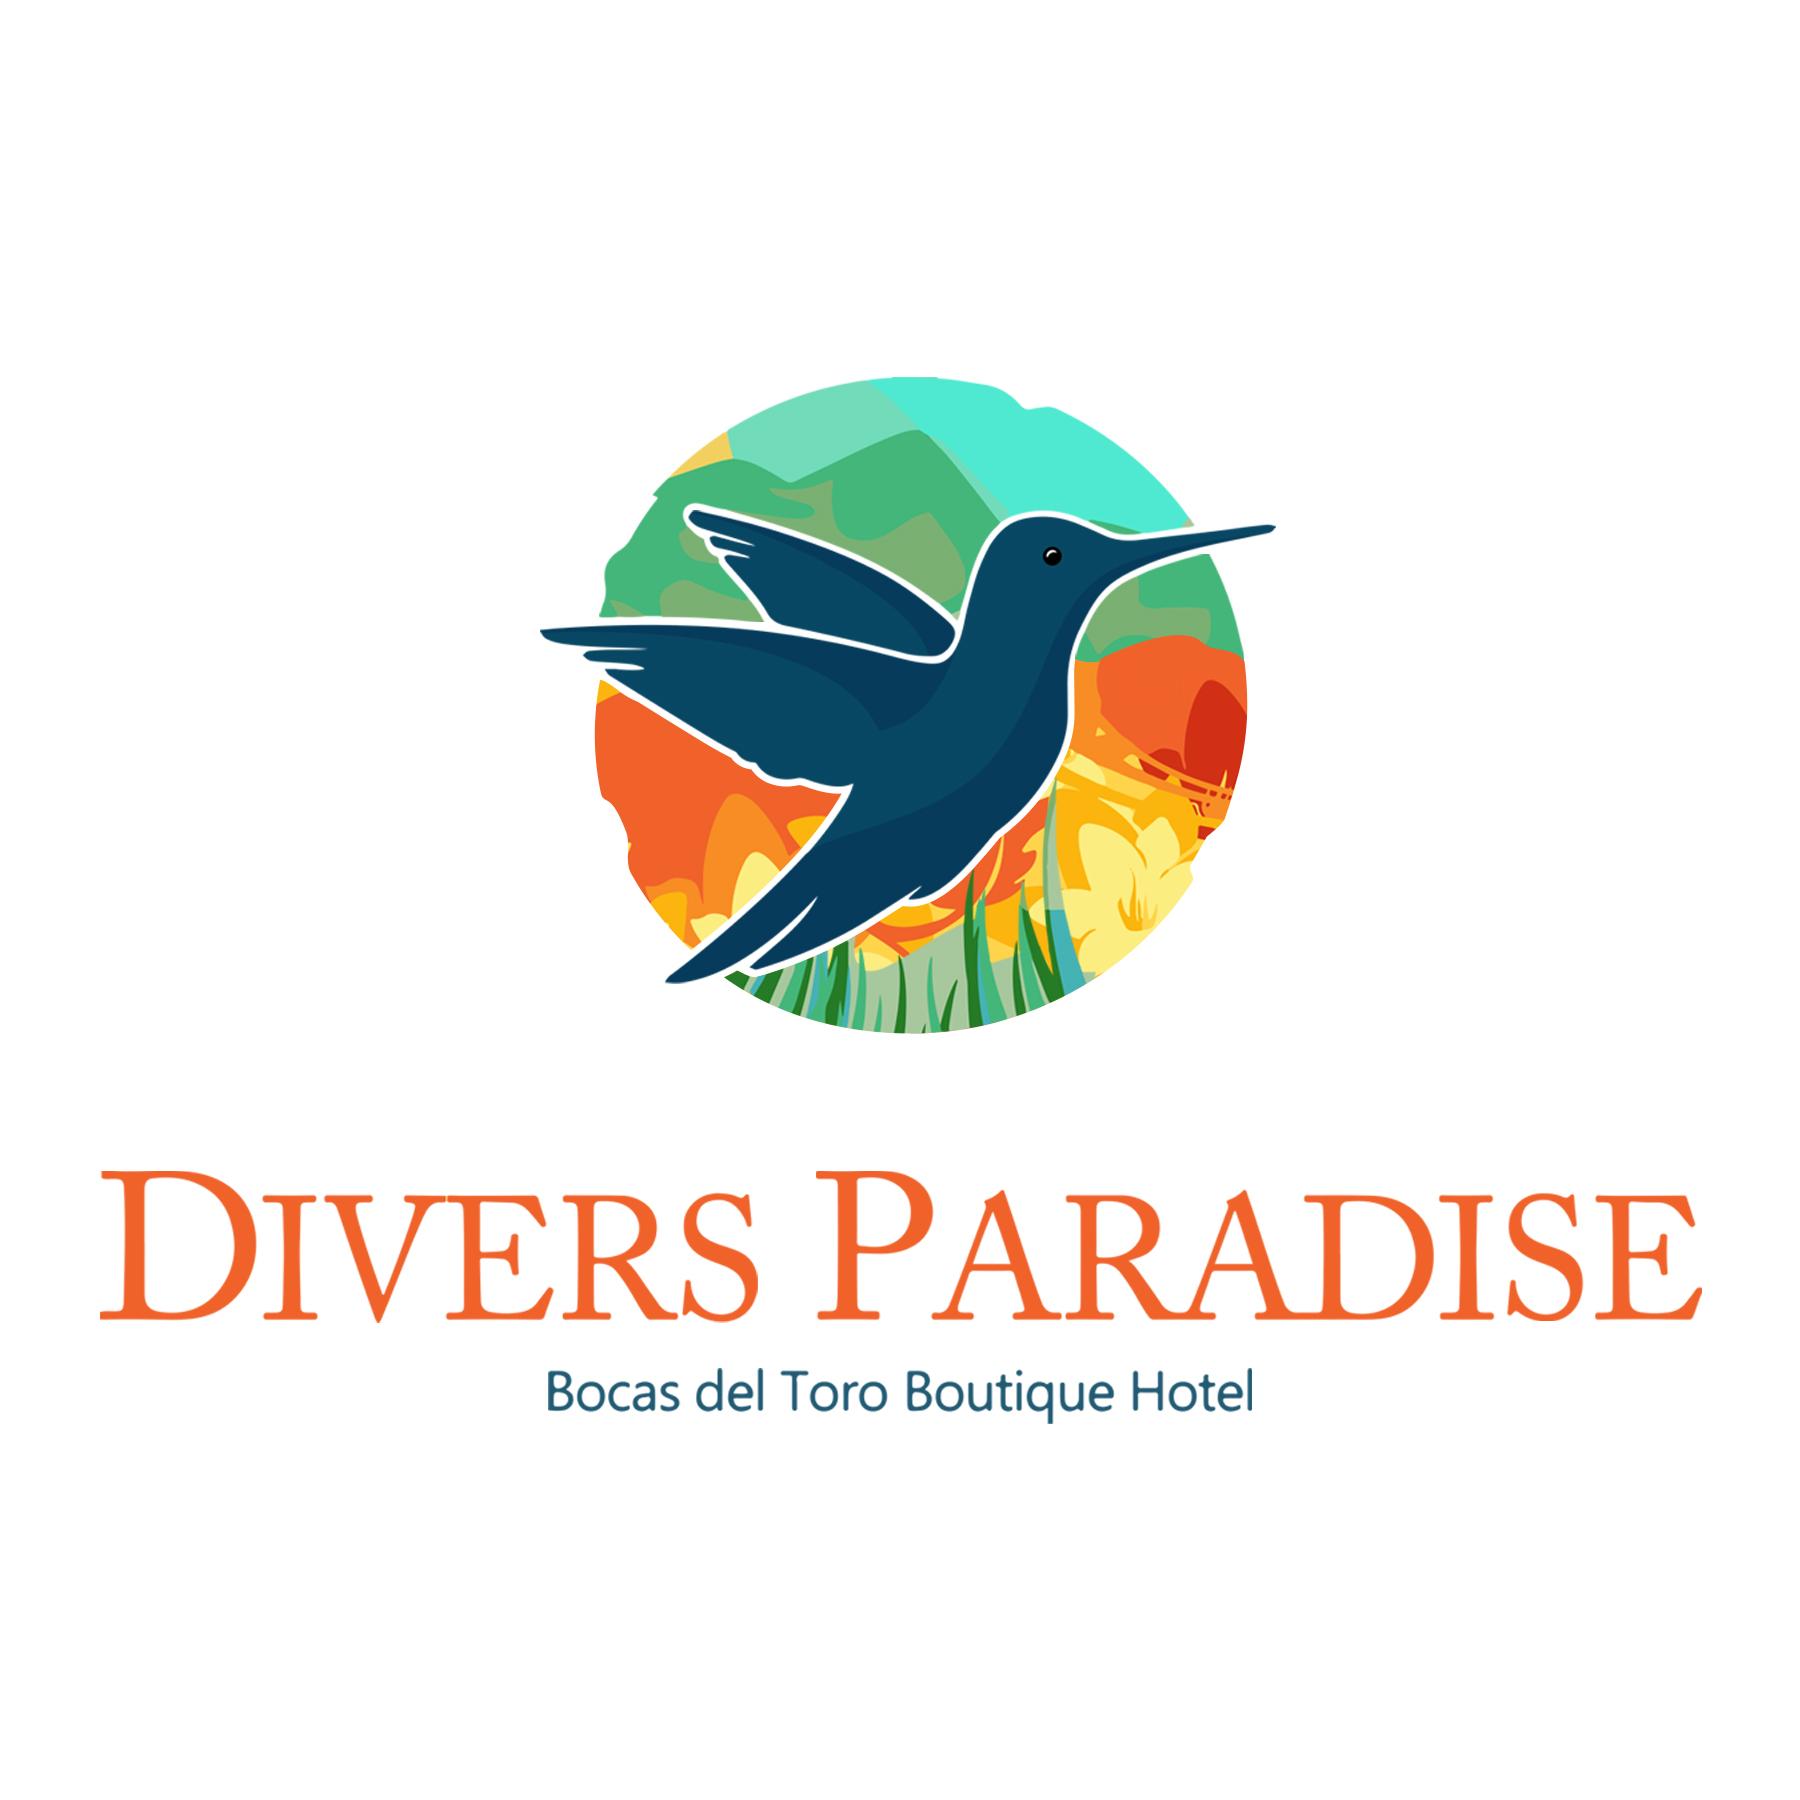 Divers Paradise Hotel